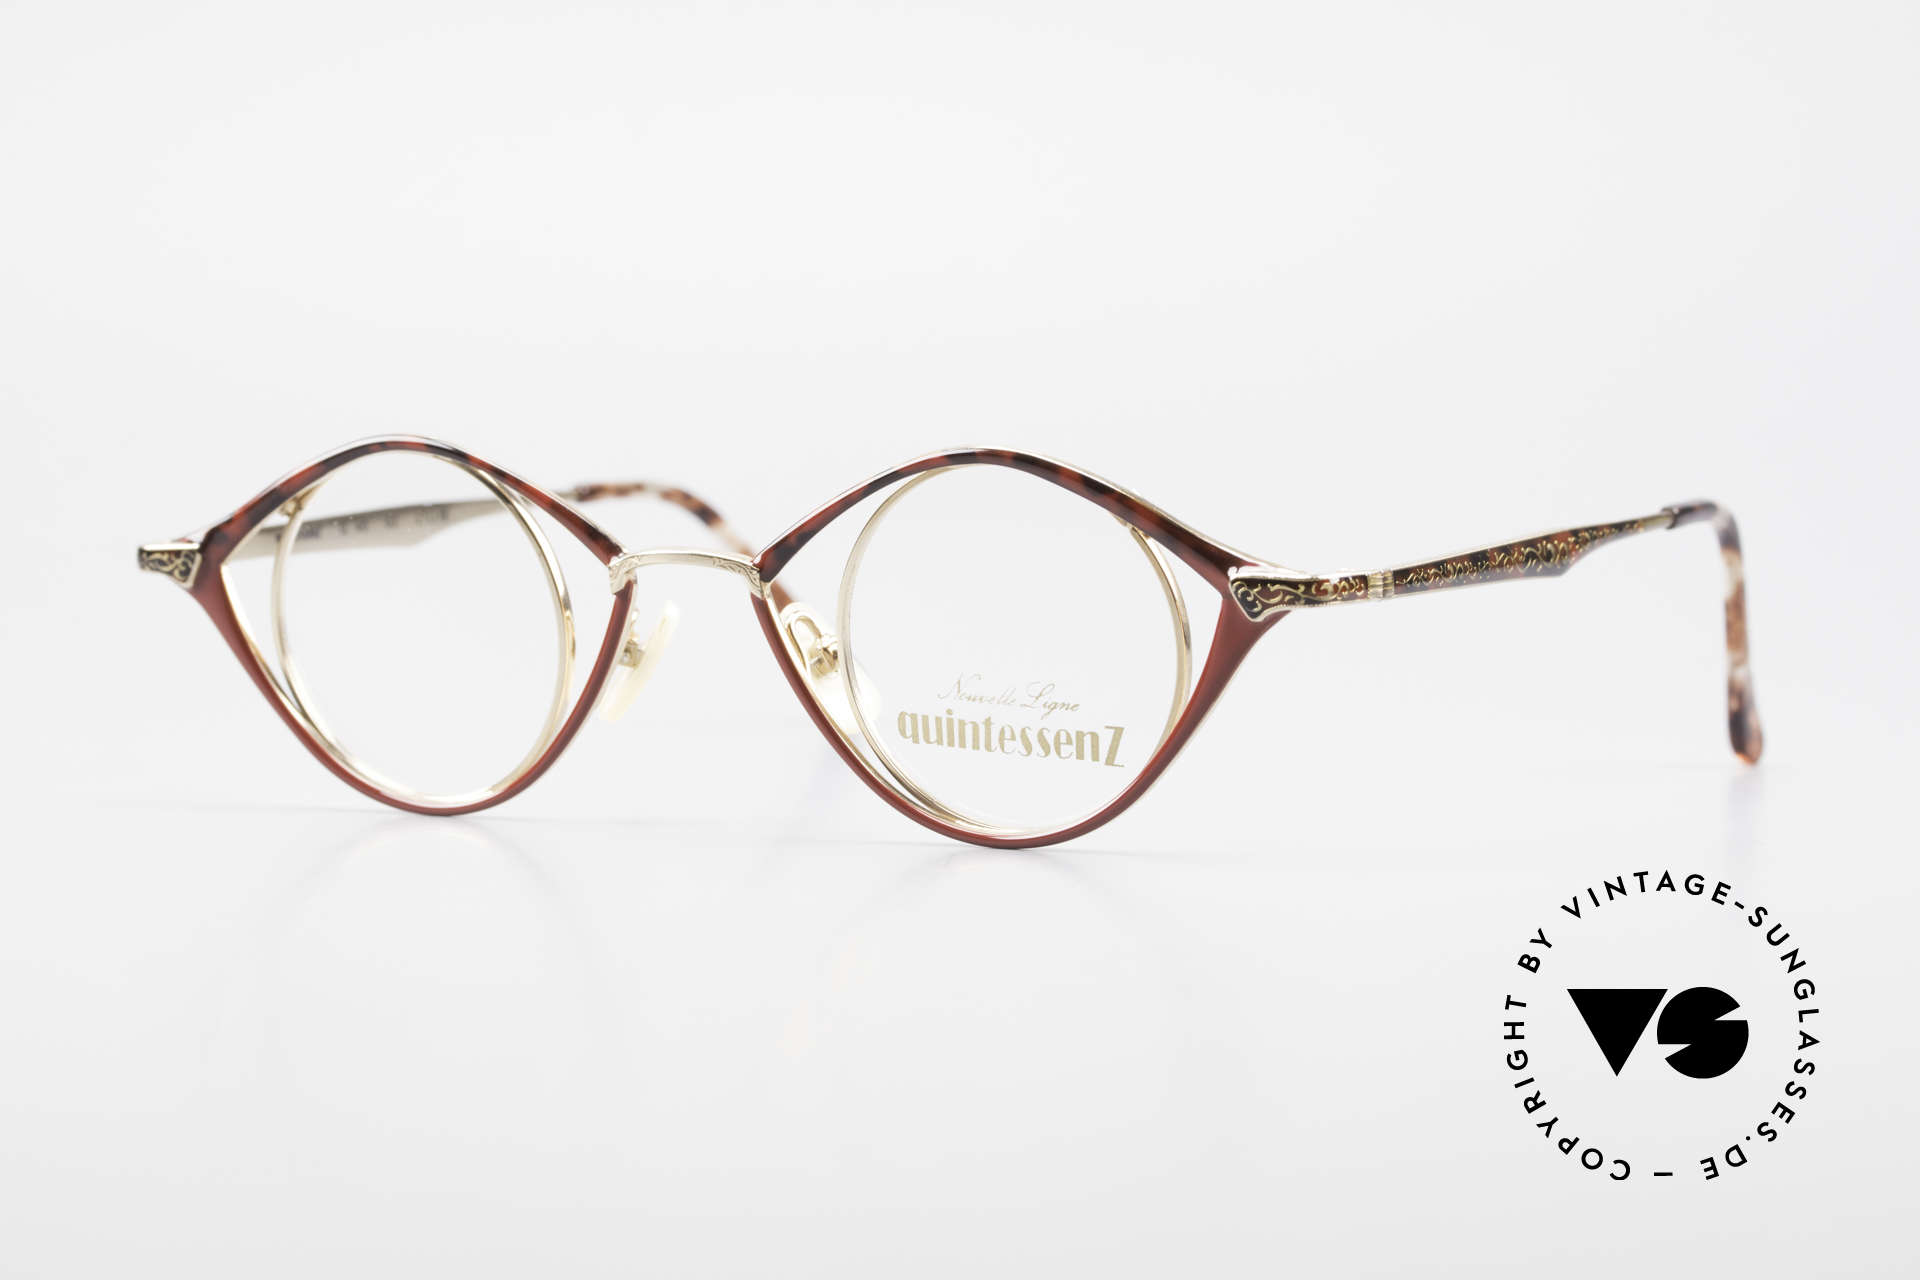 Nouvelle Ligne Q40 Vintage Ladies Specs No Retro, Nouvelle Ligne Germany, Q40, MADE IN JAPAN, Made for Women